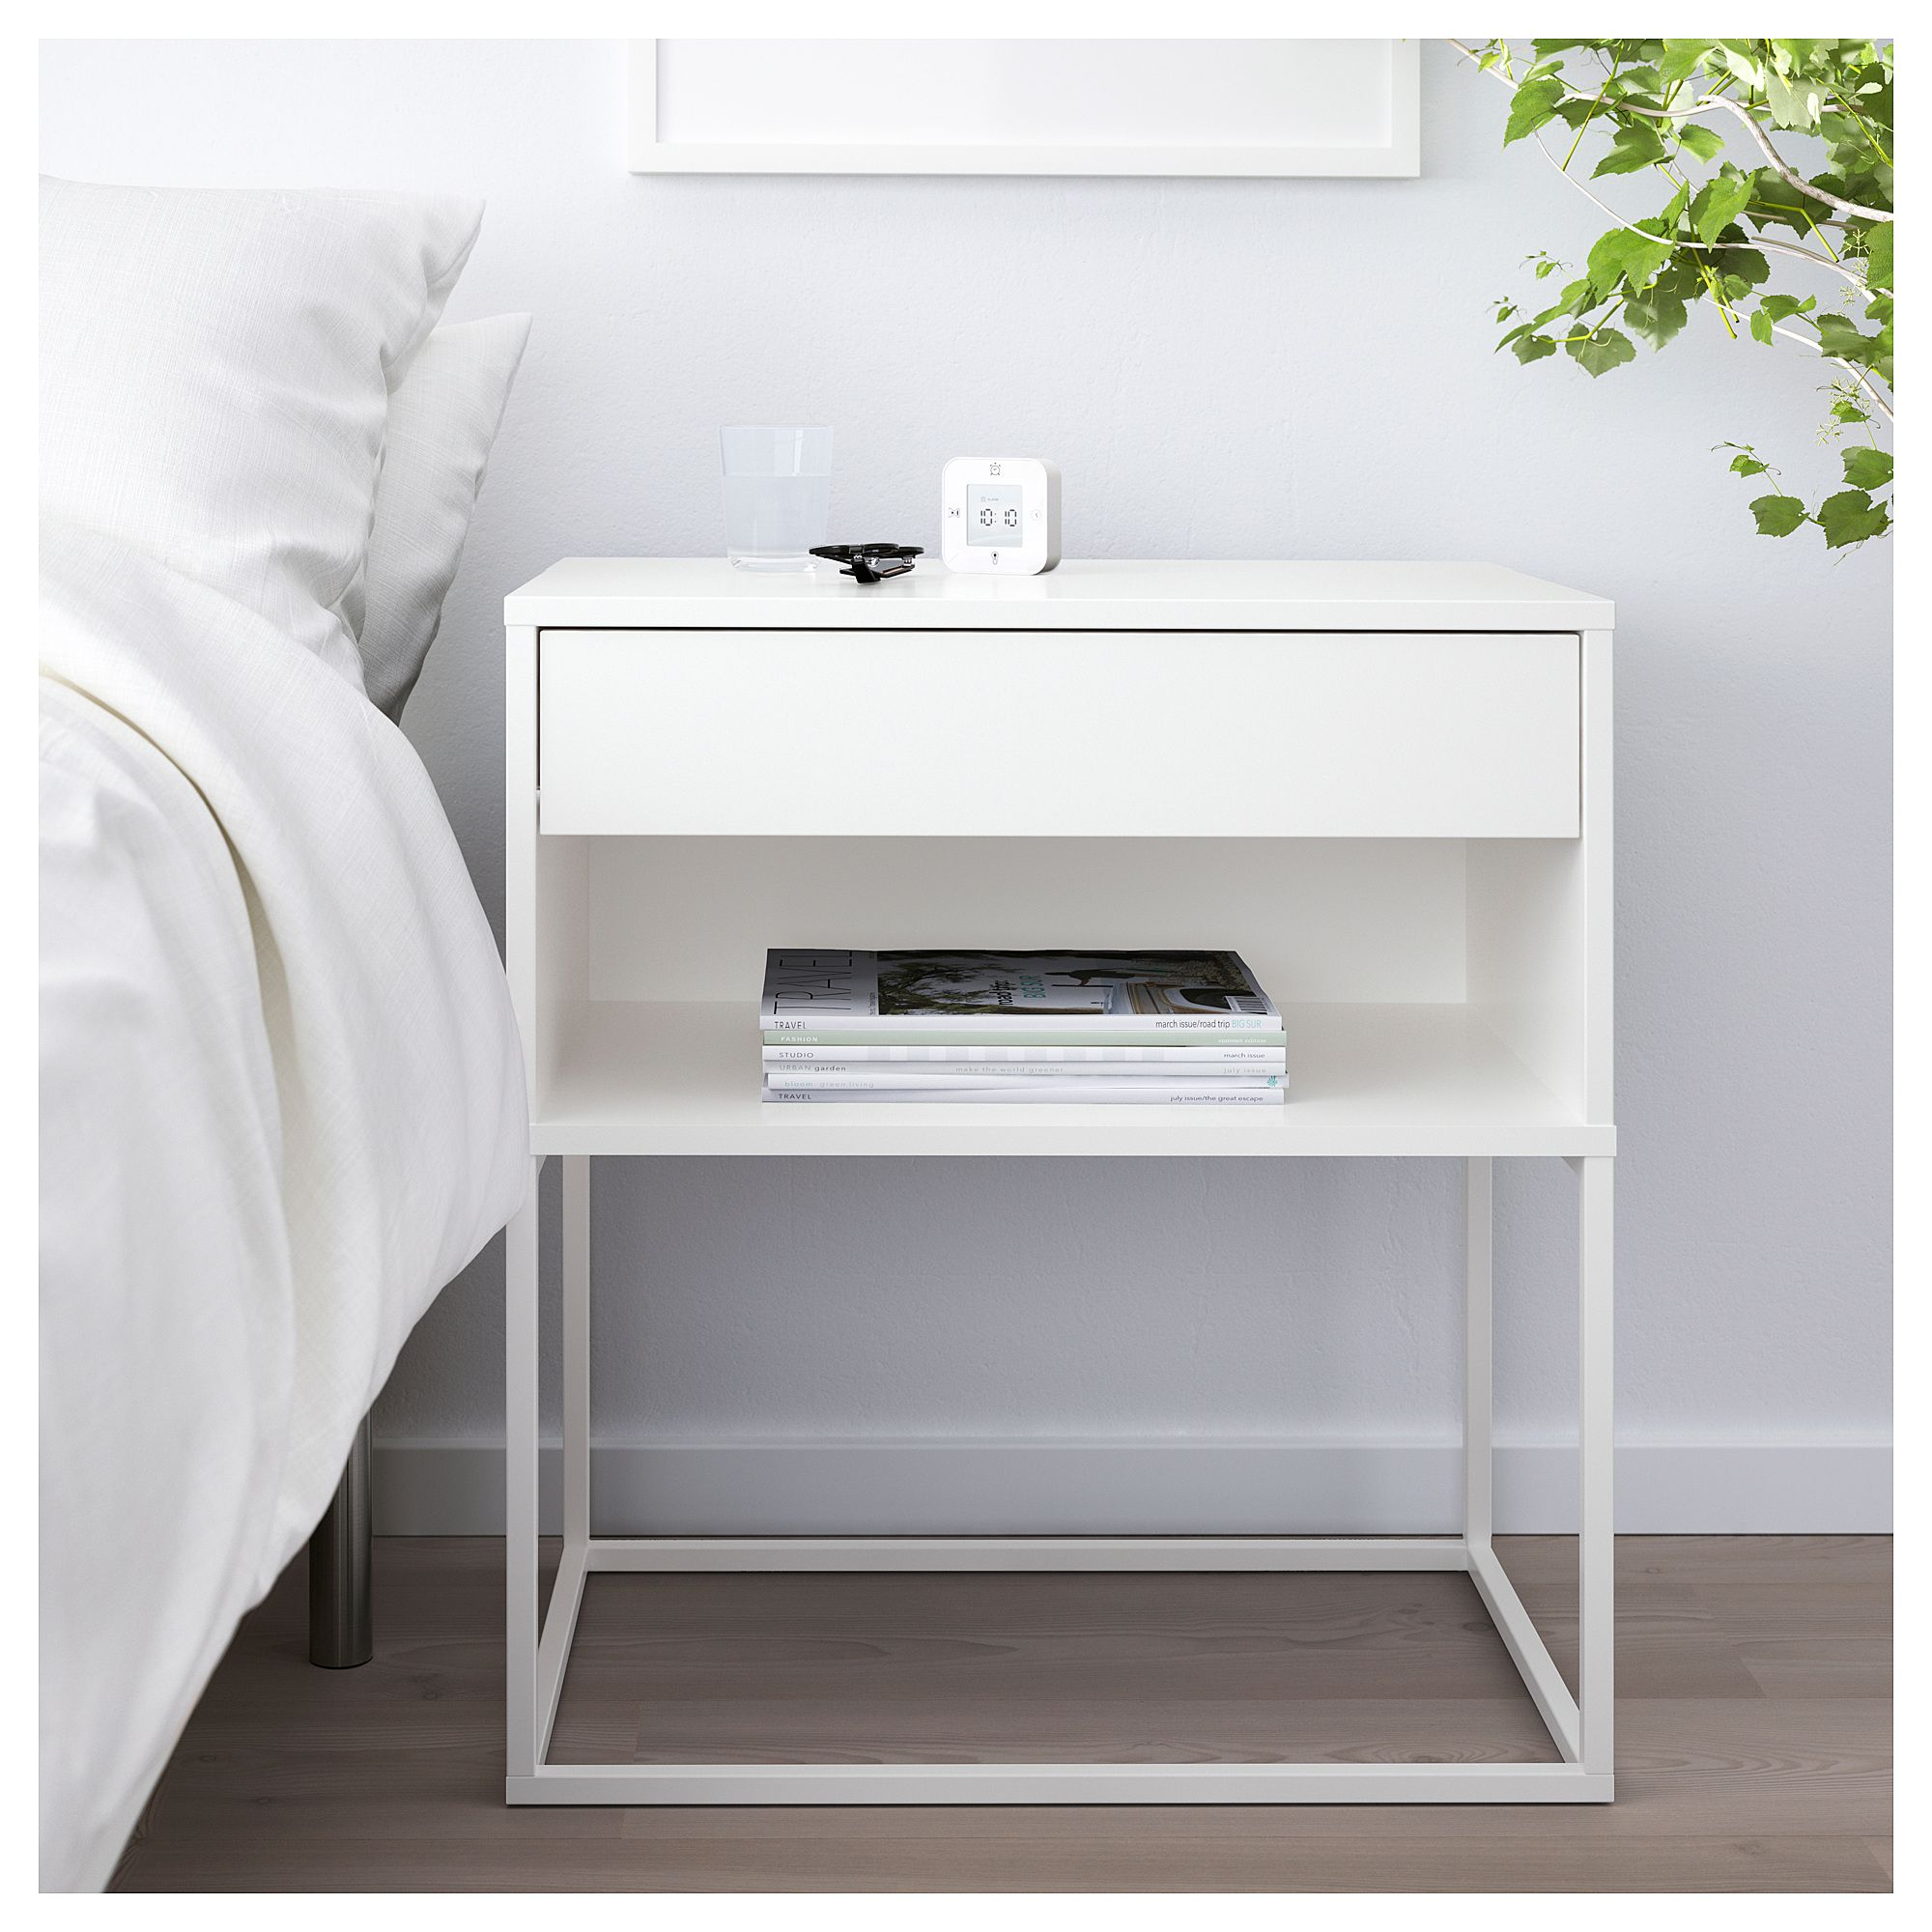 Ikea Nachttisch Metall Weiß